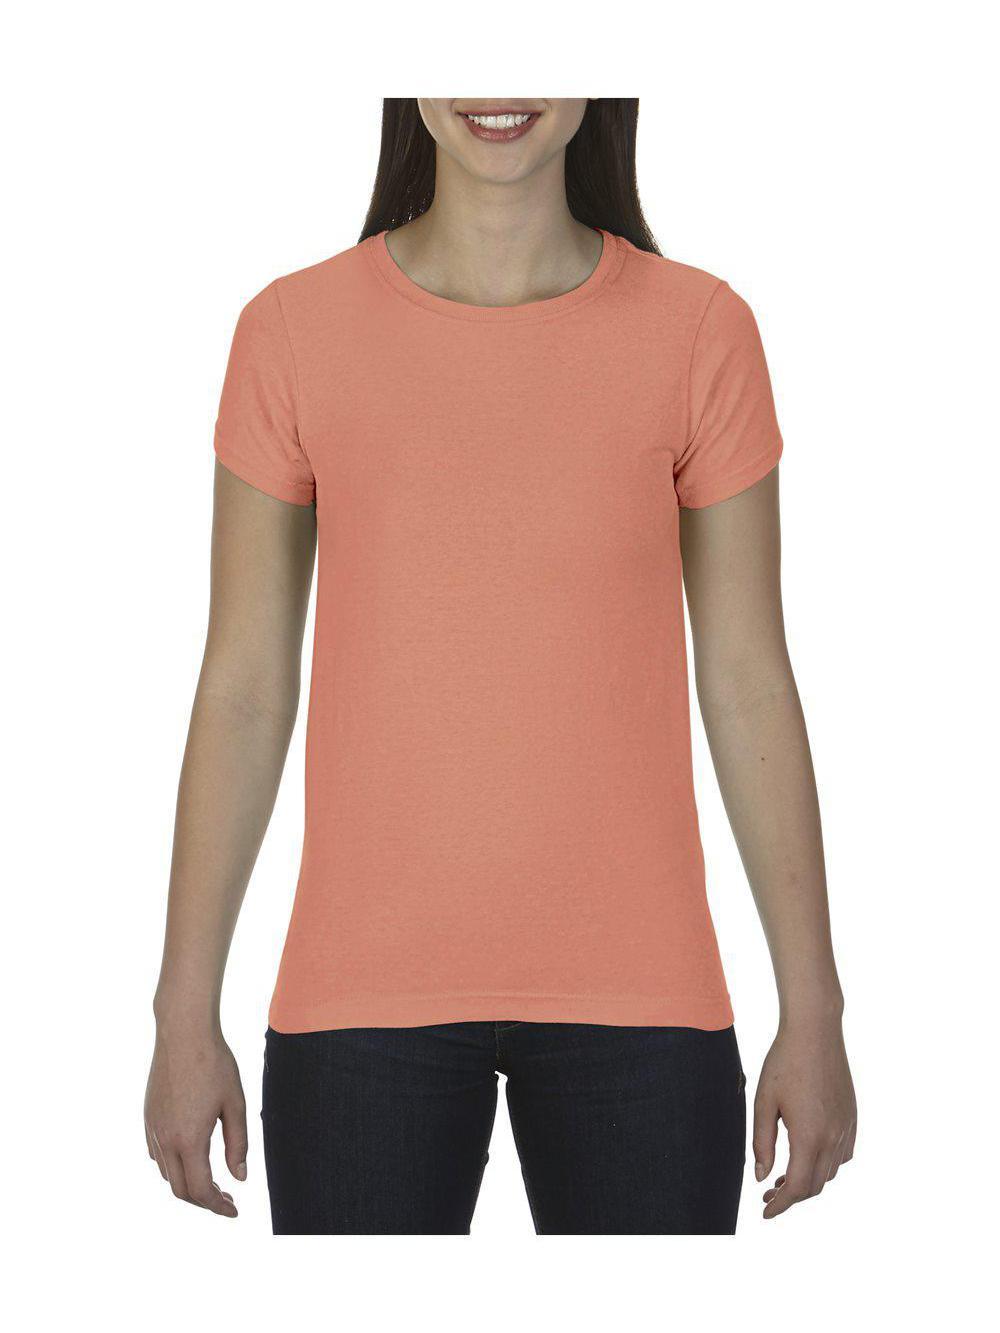 Comfort-Colors-Pigment-Dyed-Ringspun-Women-039-s-Short-Sleeve-T-Shirt-3333 thumbnail 27